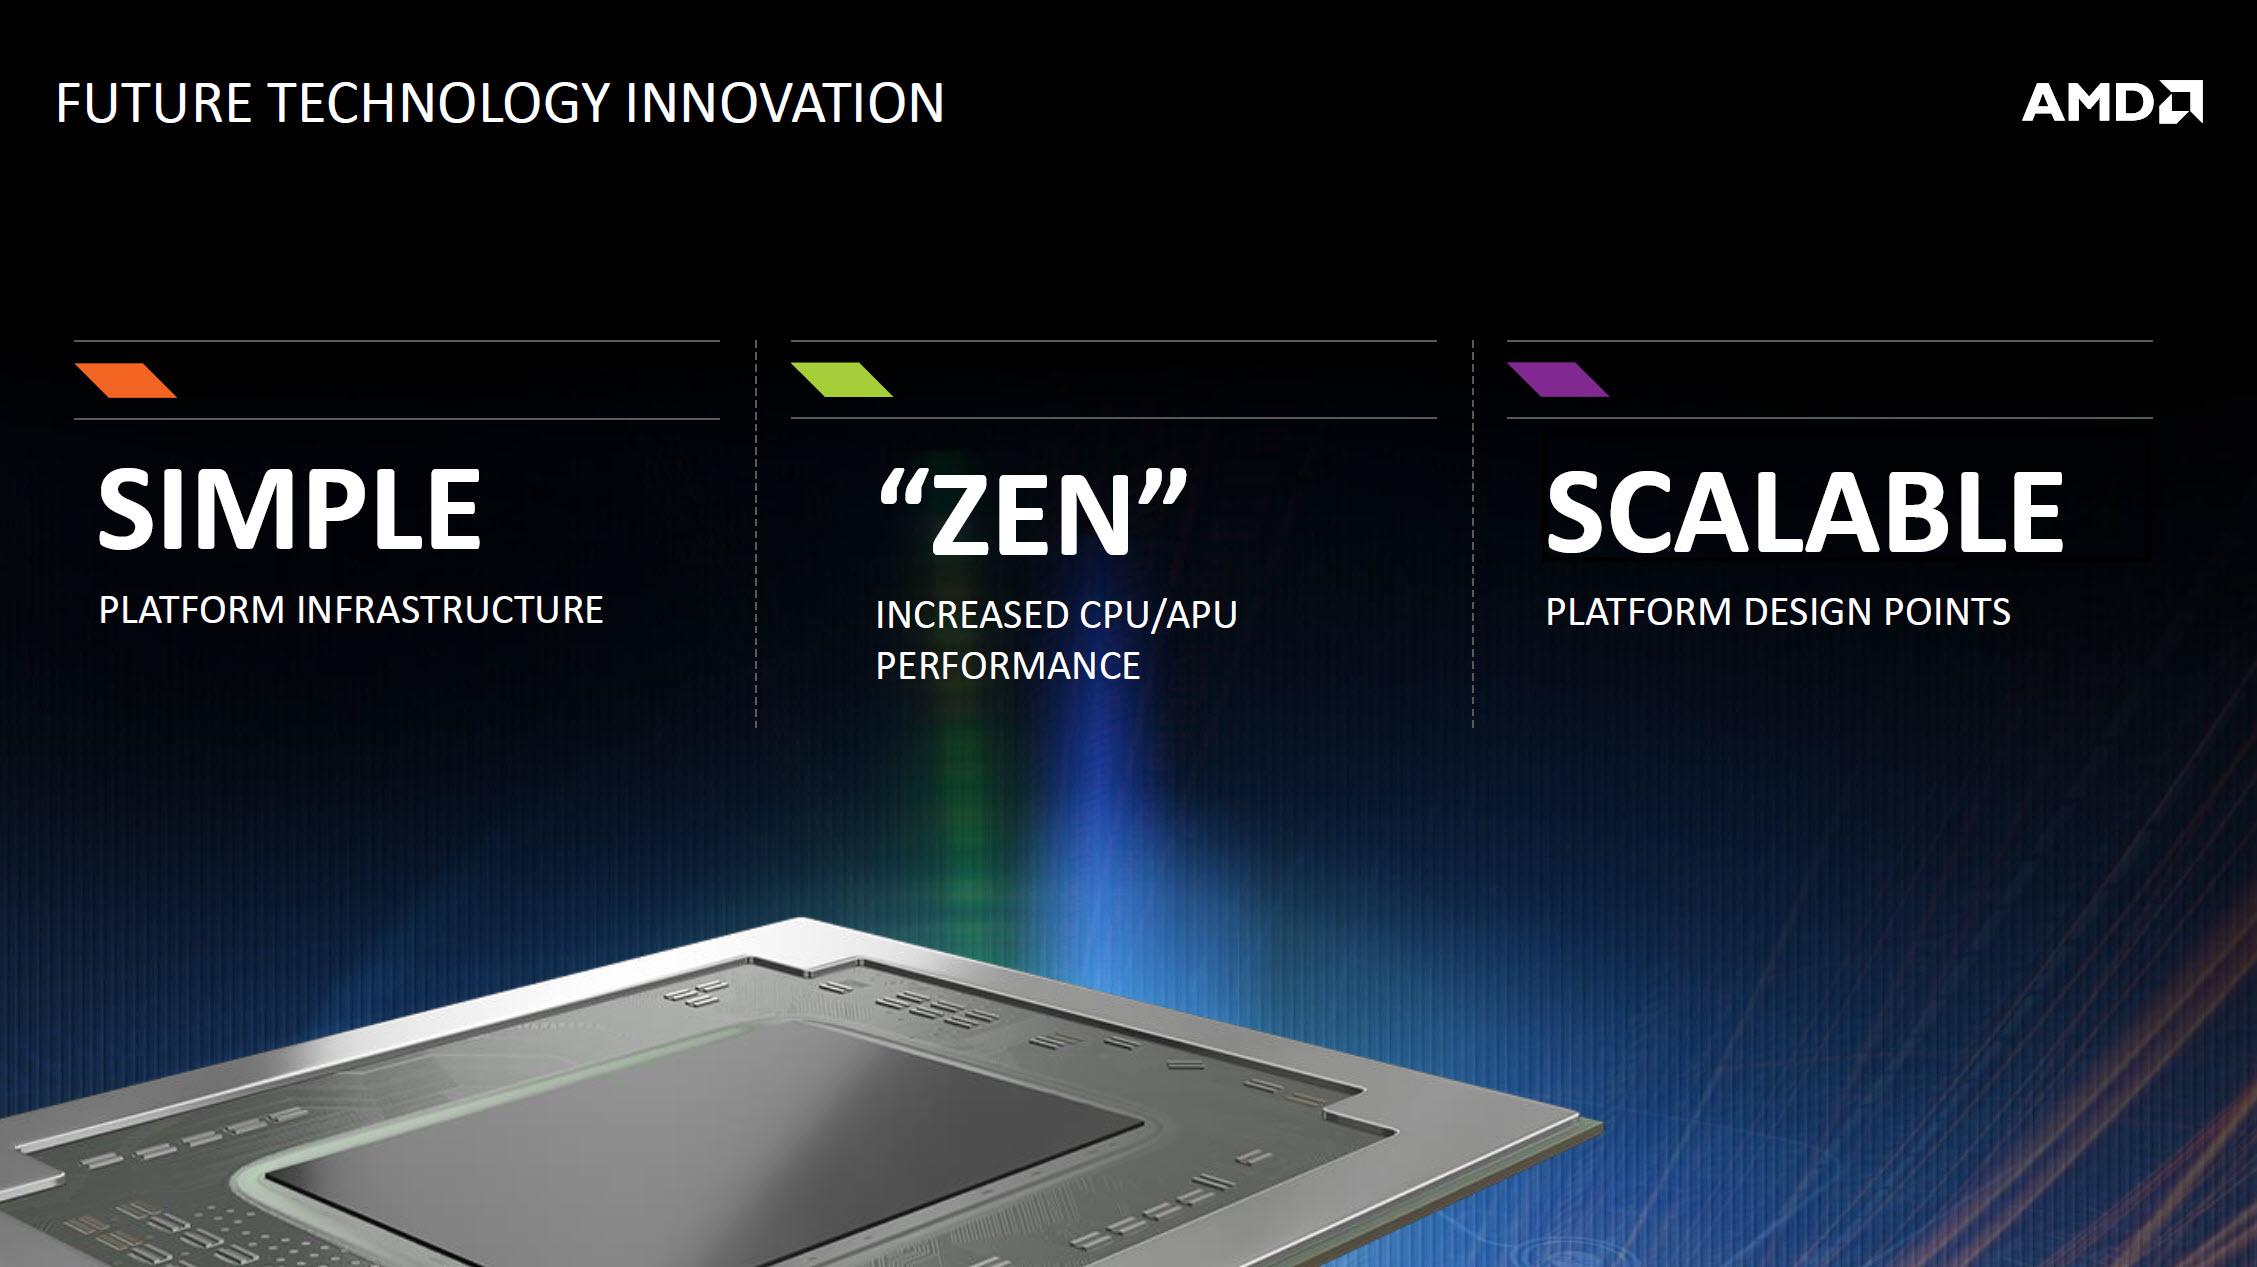 AMD Zen Raven Ridge APU Features HBM, 128GB/s Of Bandwidth & Large GPU